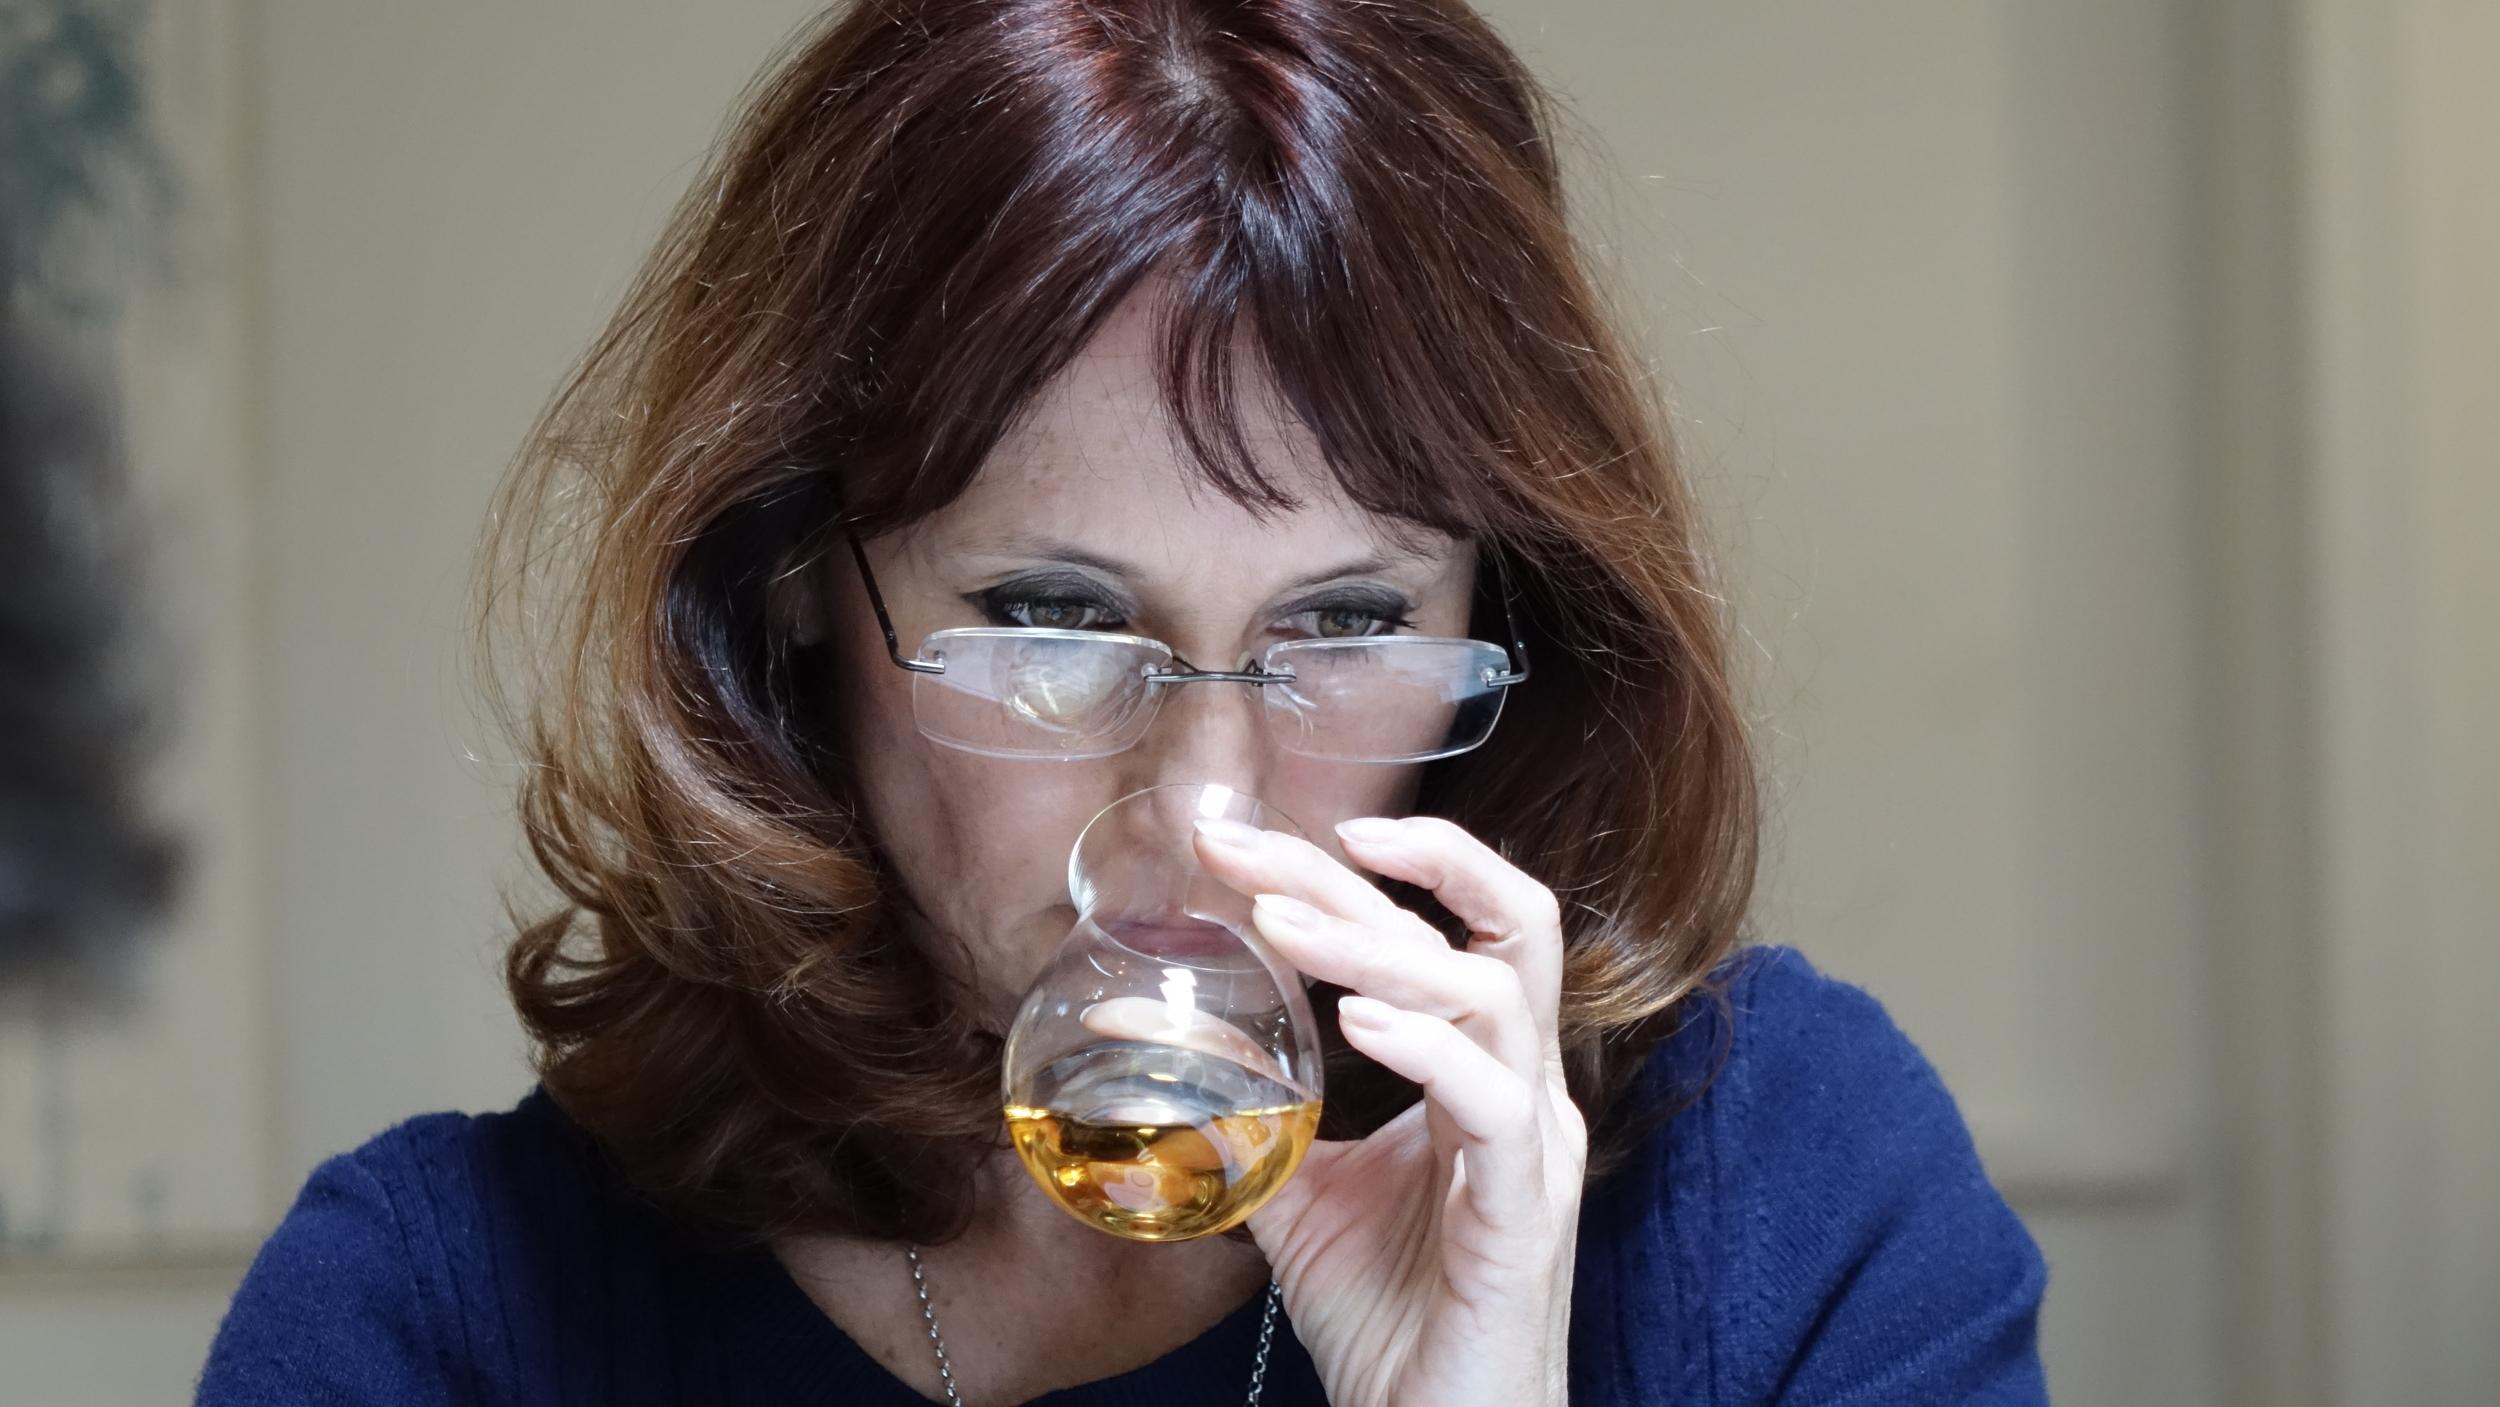 Agi Toth - 2015 International Whisky Competiton